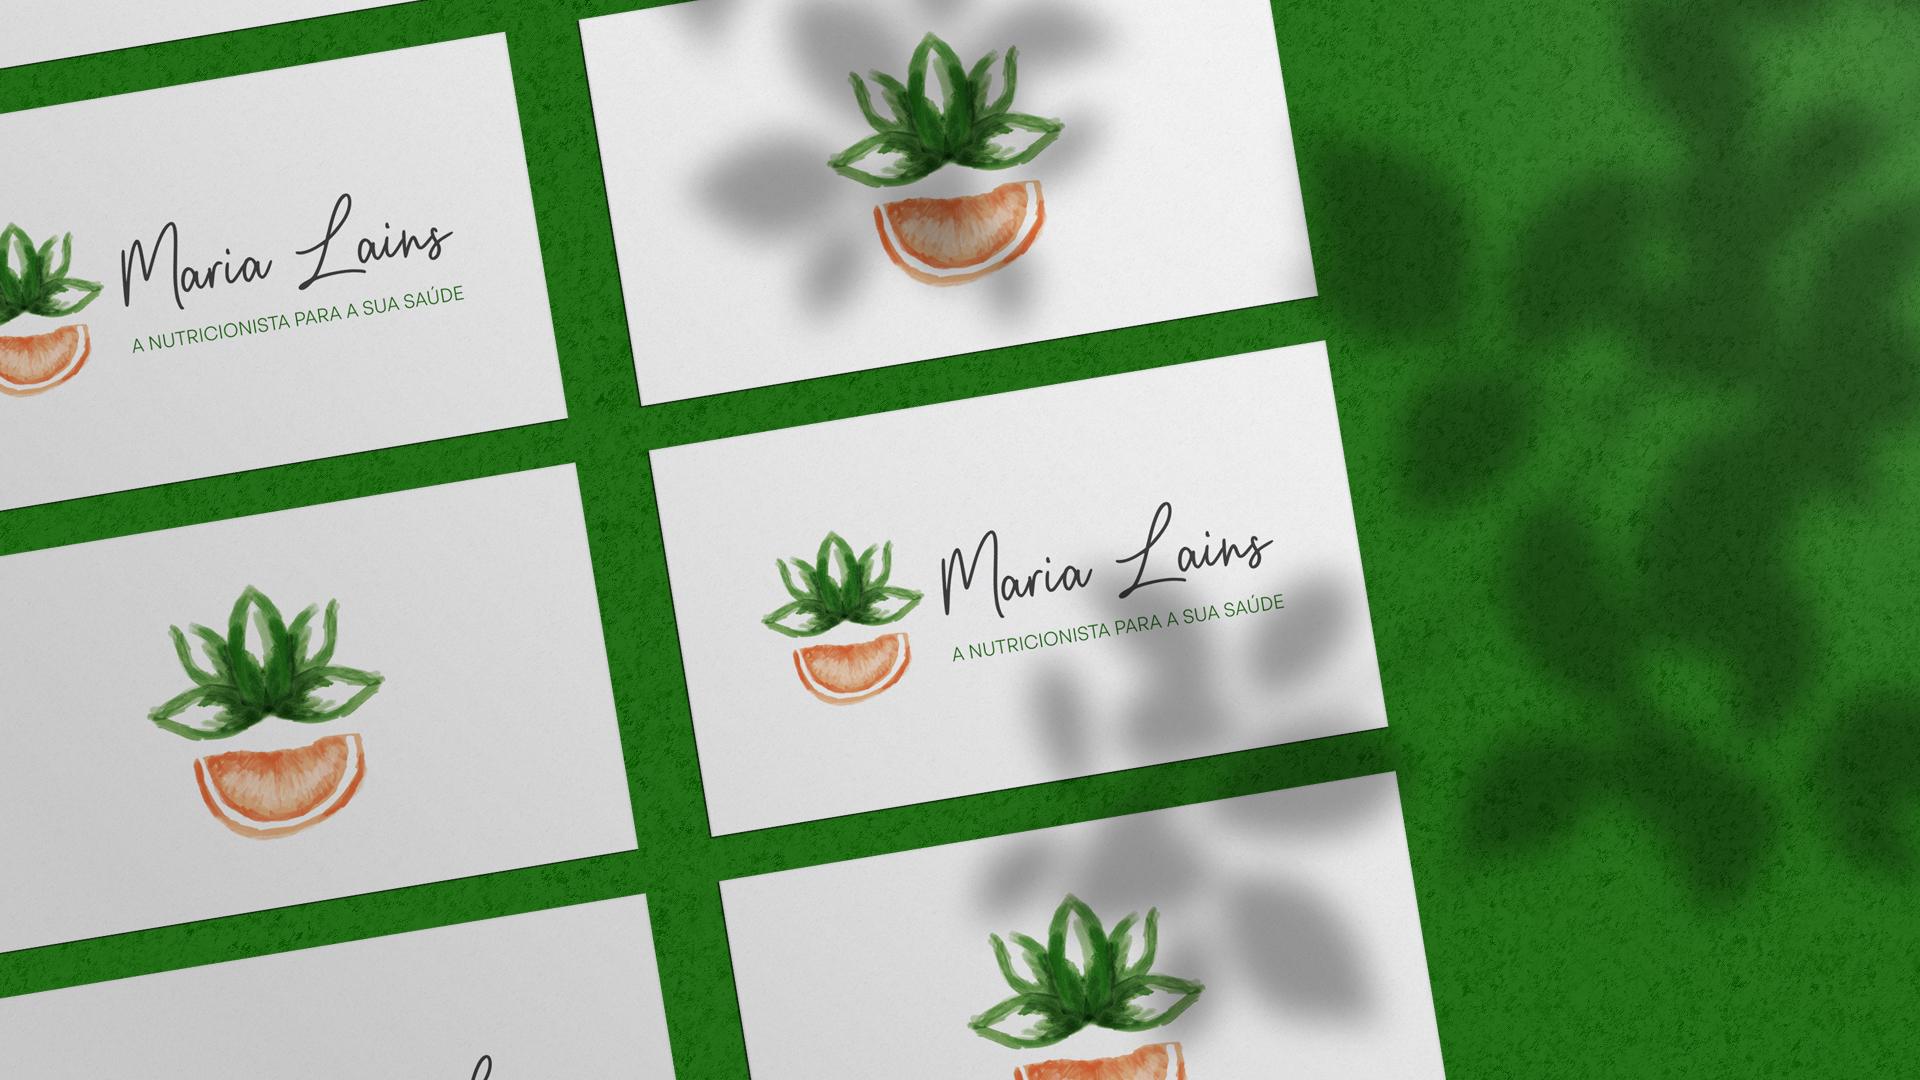 Wellness Brand Design - Nutritionist Business Cards